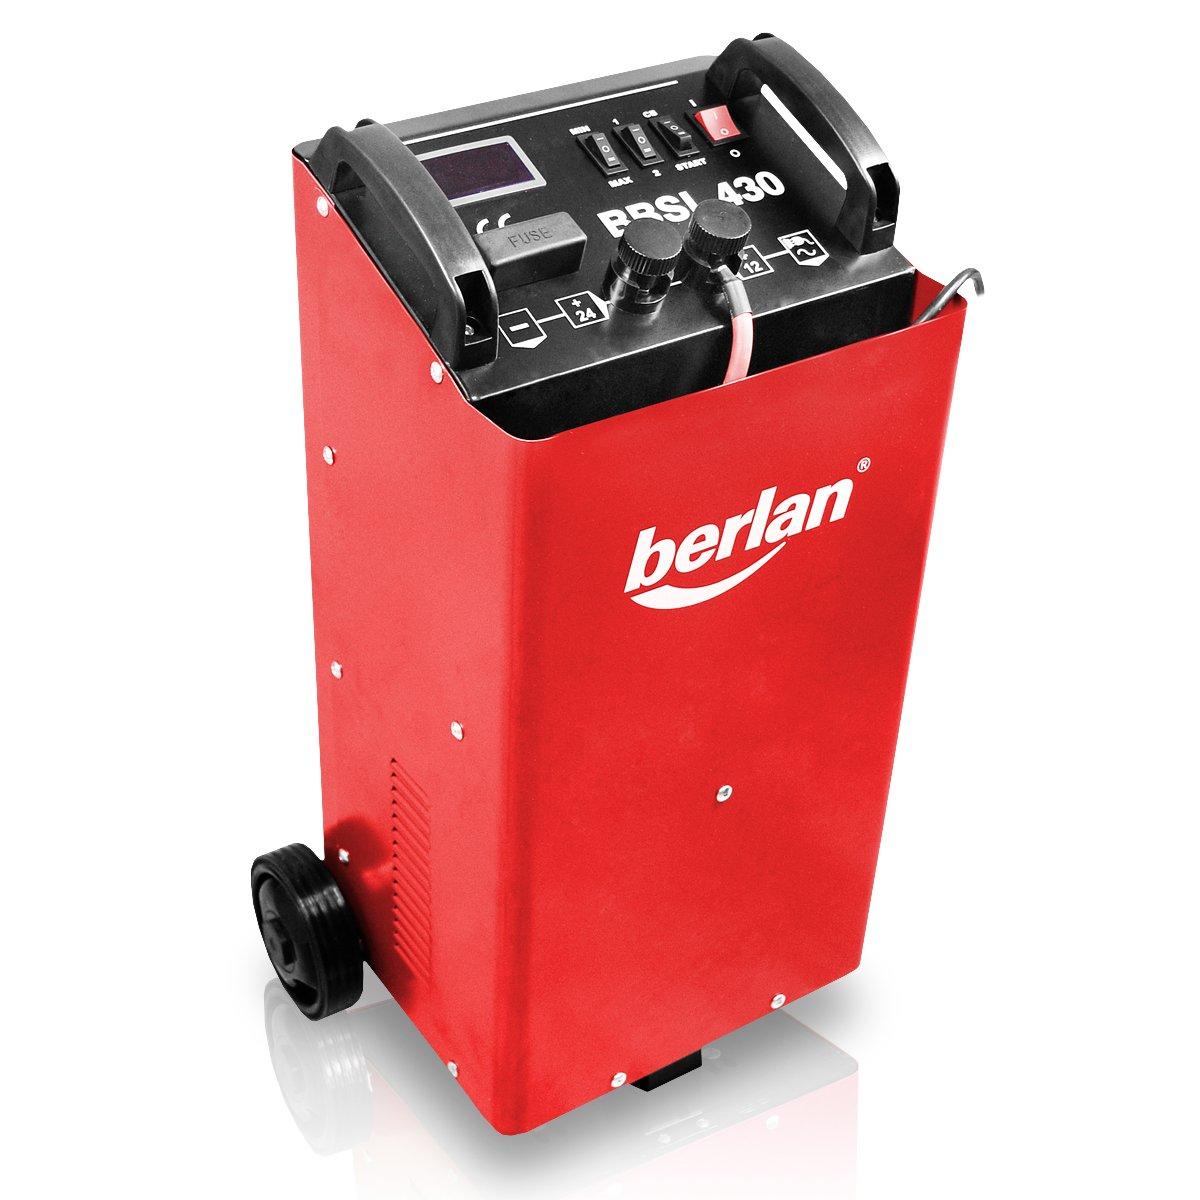 Batterie Start- und Ladegerä t Booster - BBSL430 Berlan